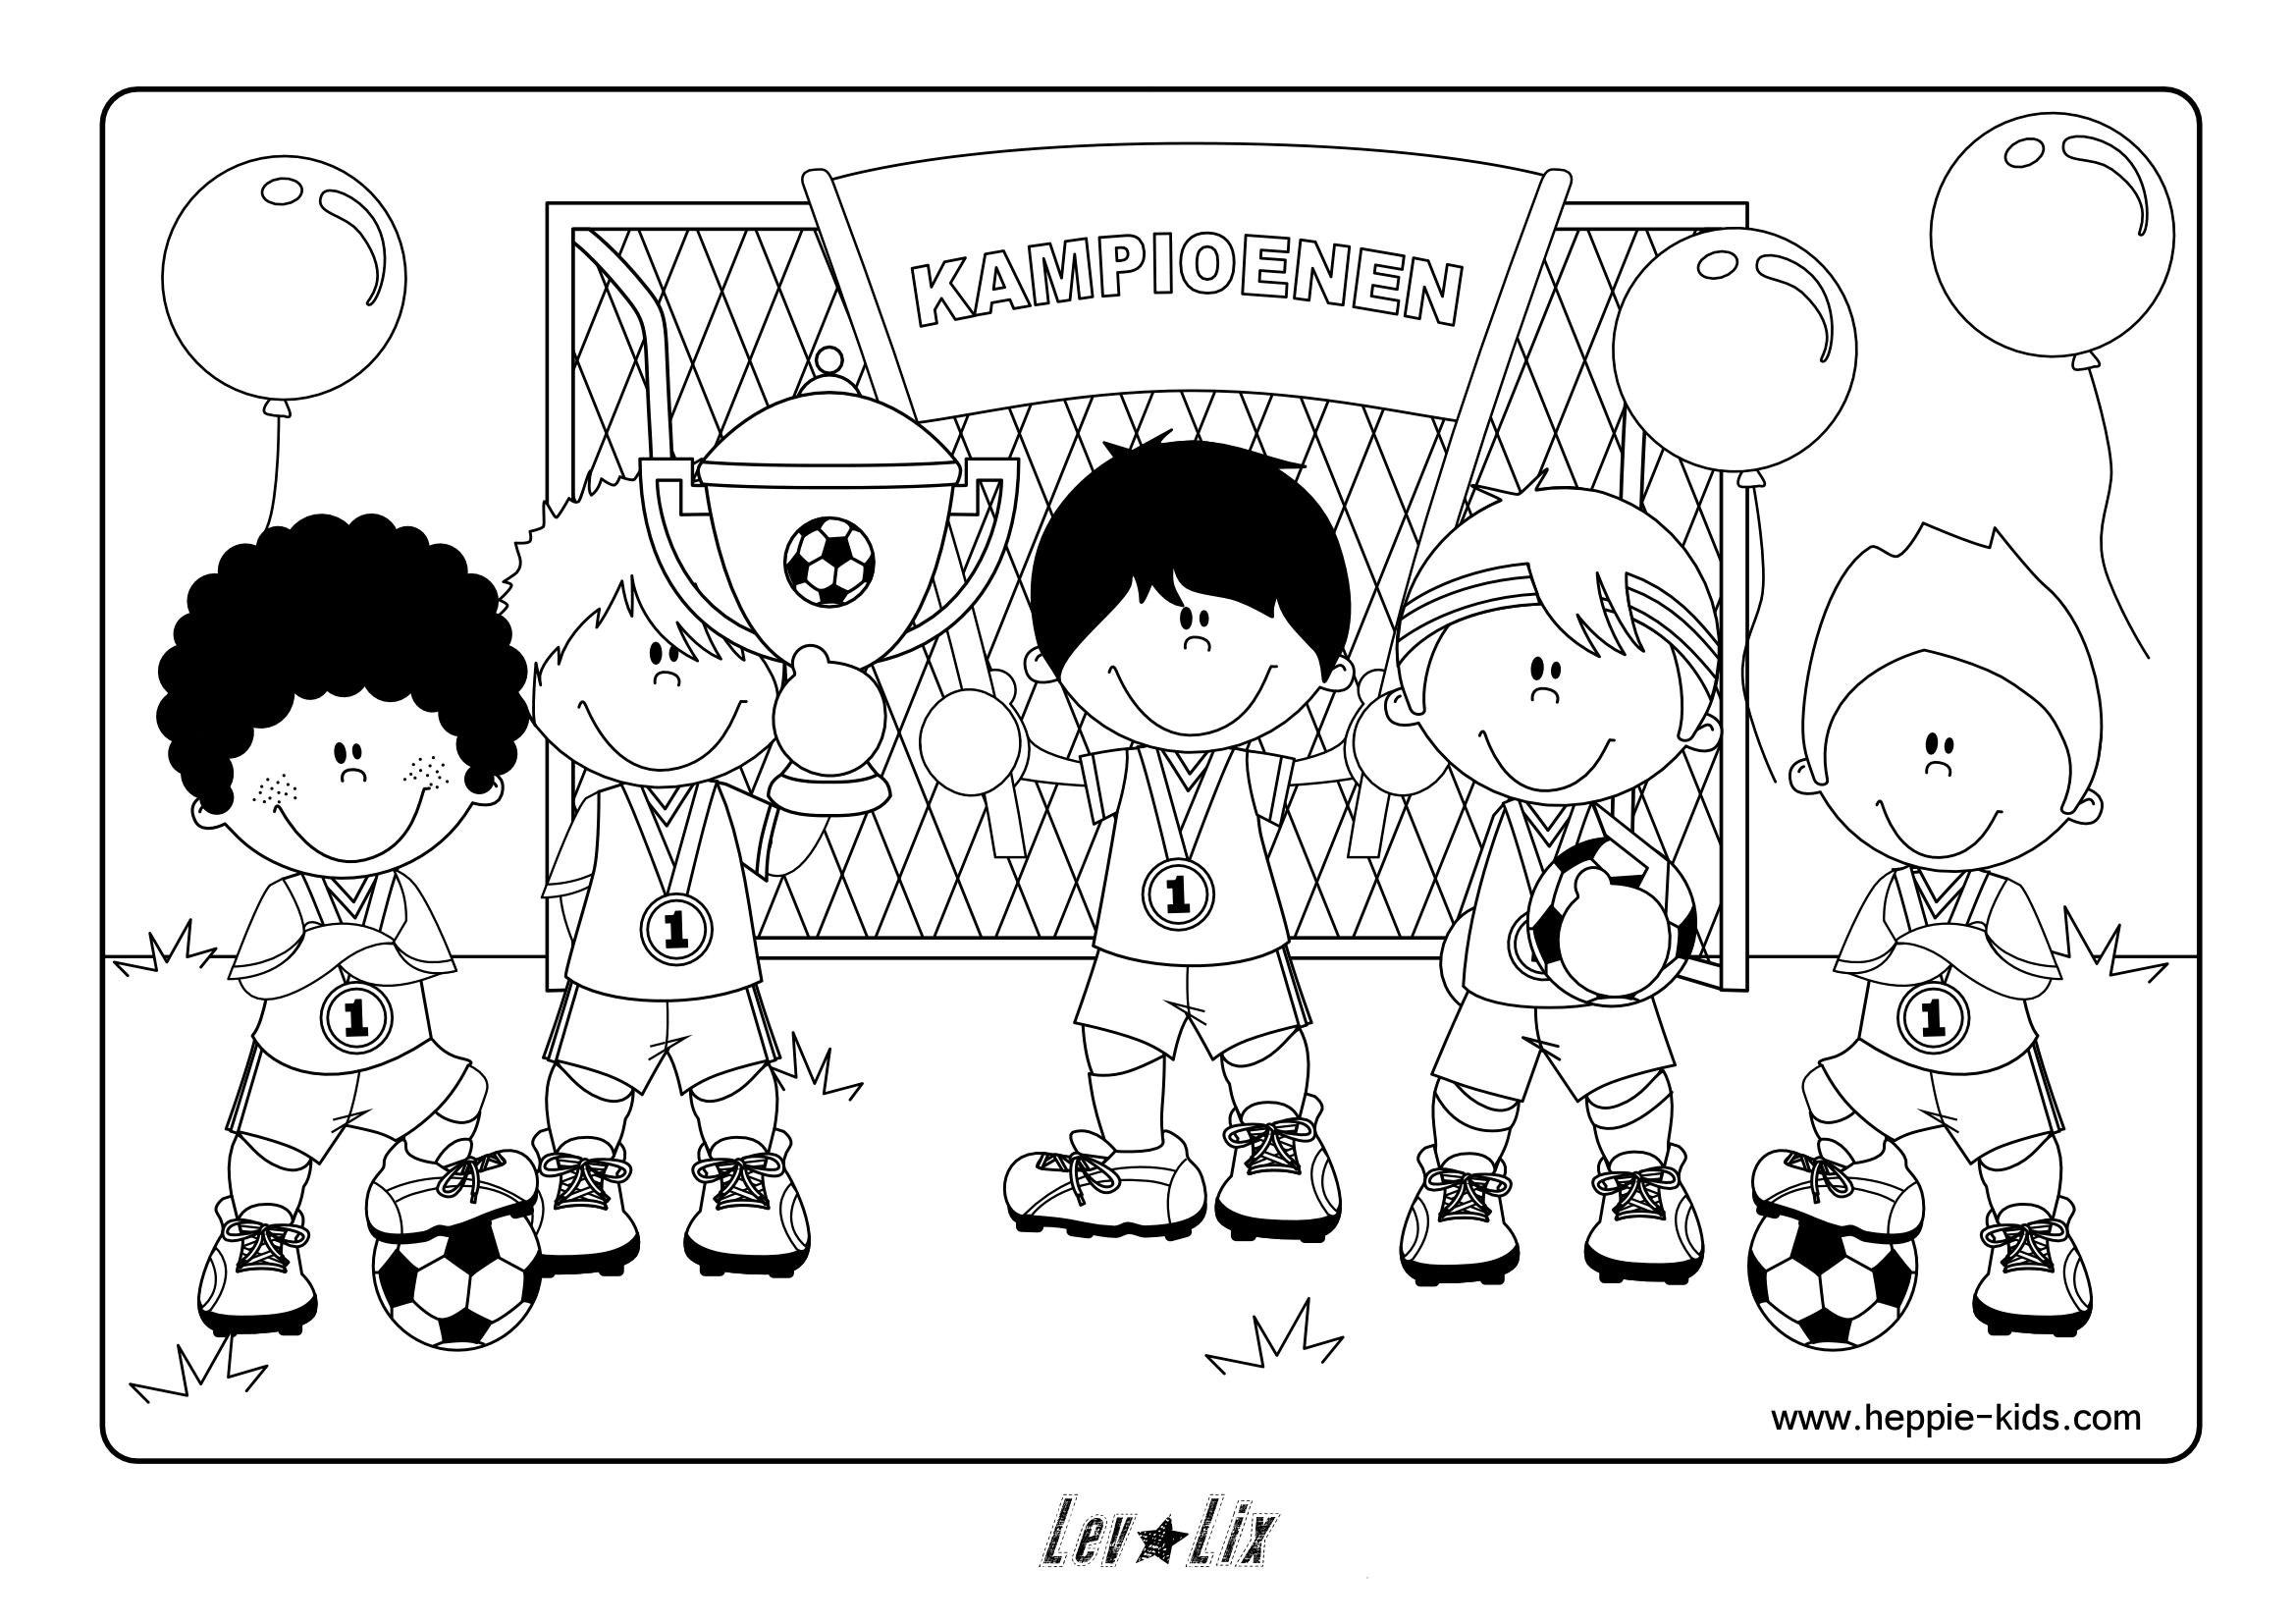 Quatang Gallery- Kleurplaat Voetbal Www Heppie Kids Com Voetbal Kleurplaten Thema